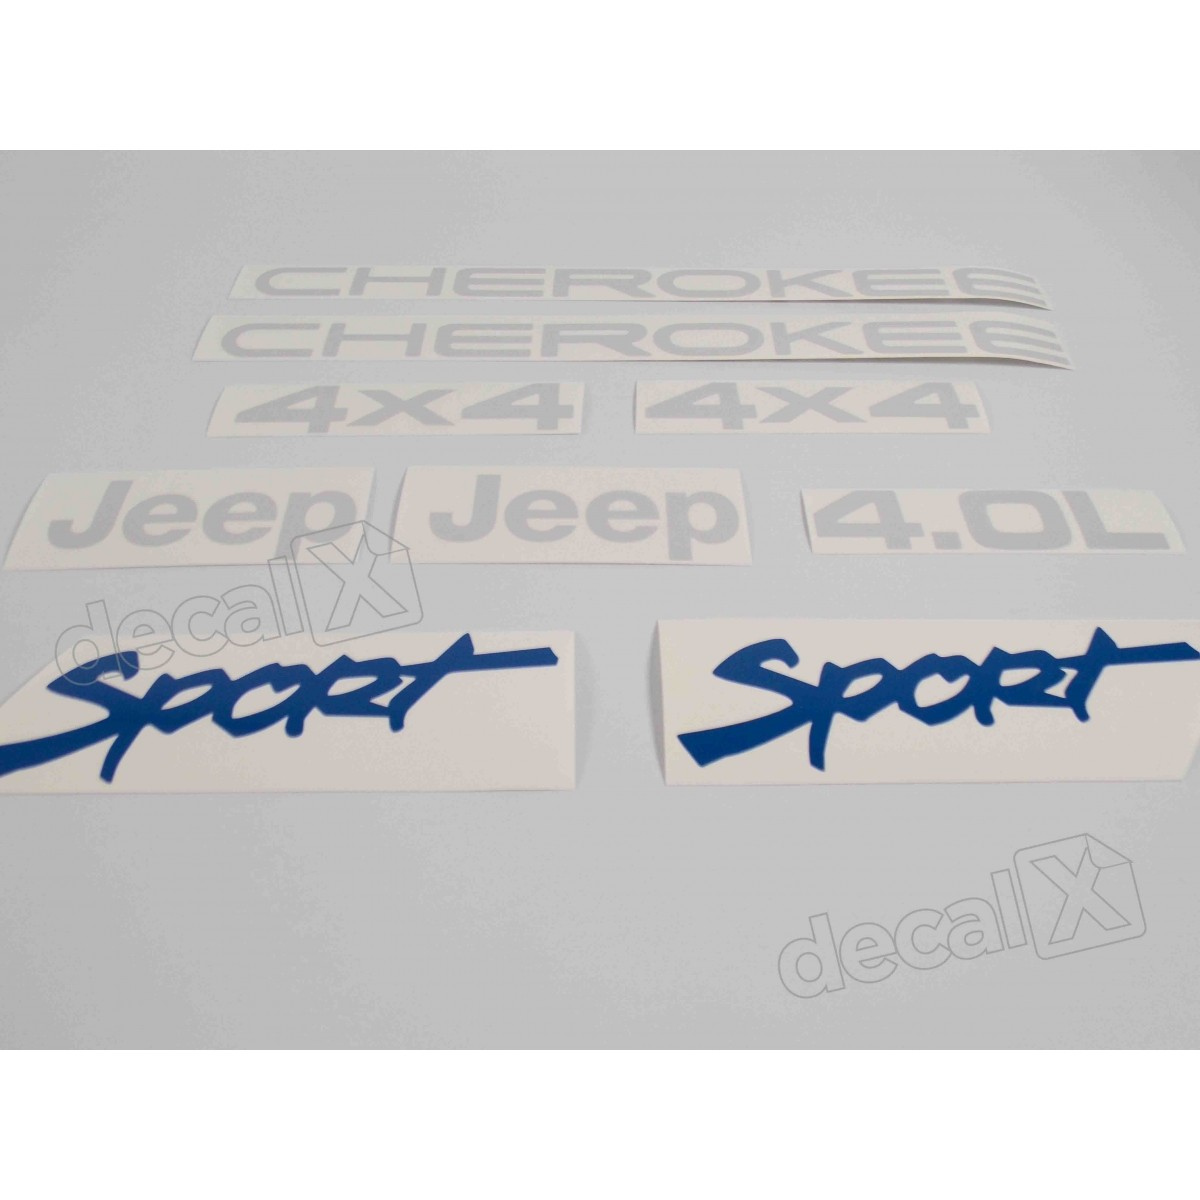 Kit Adesivo Cherokee 4x4 4.0l Sport - Decalx